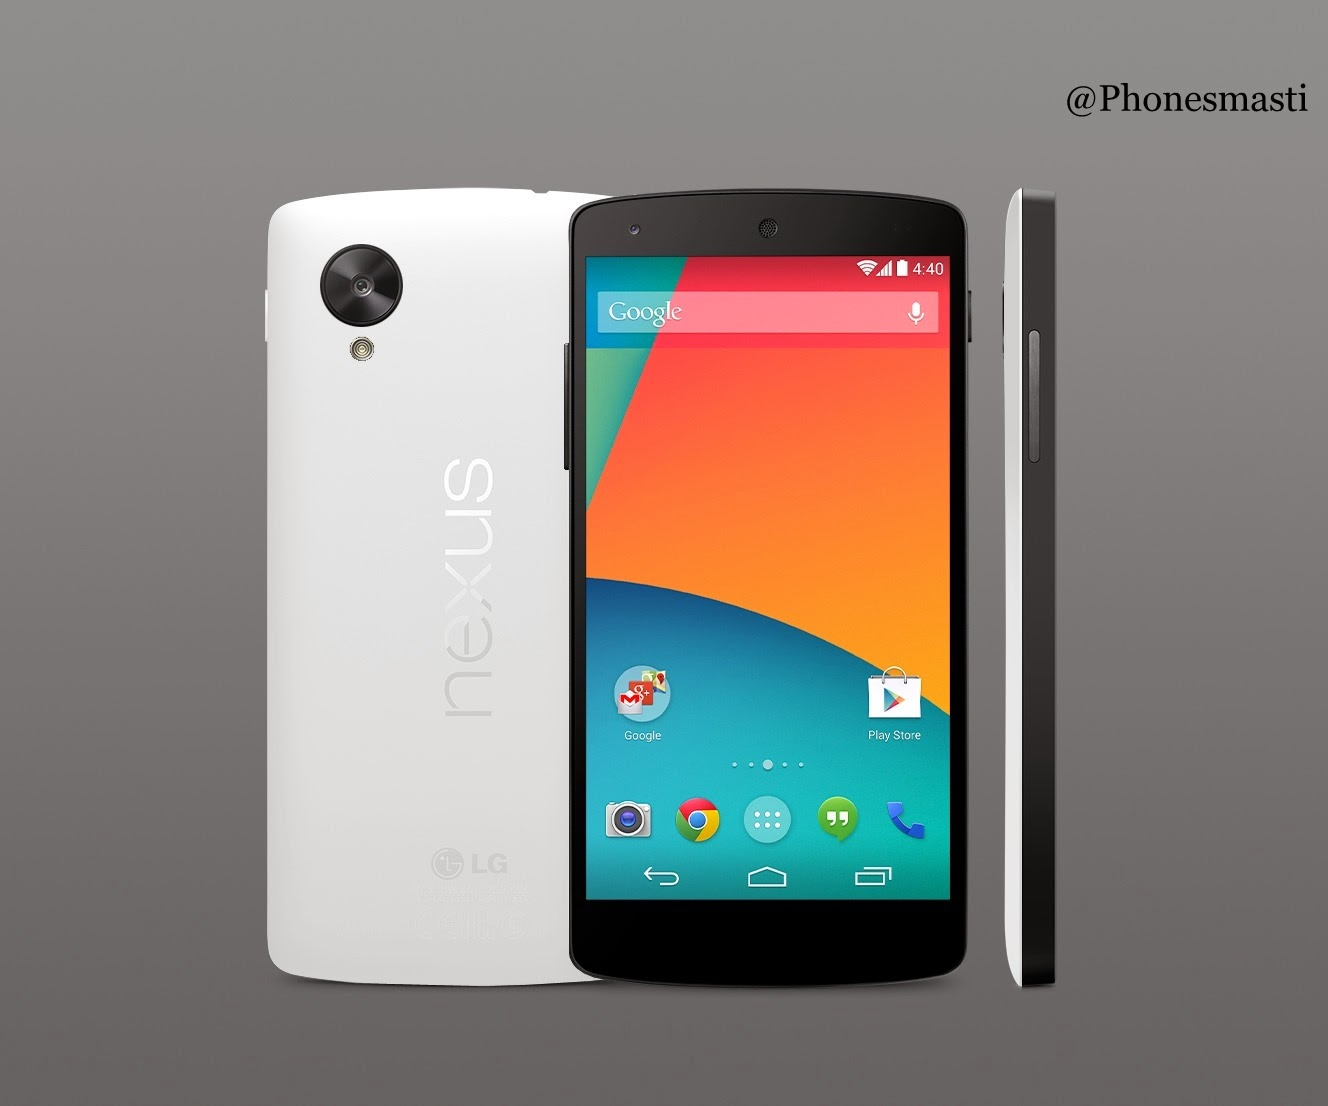 Google Nexus 5 | Phones Masti